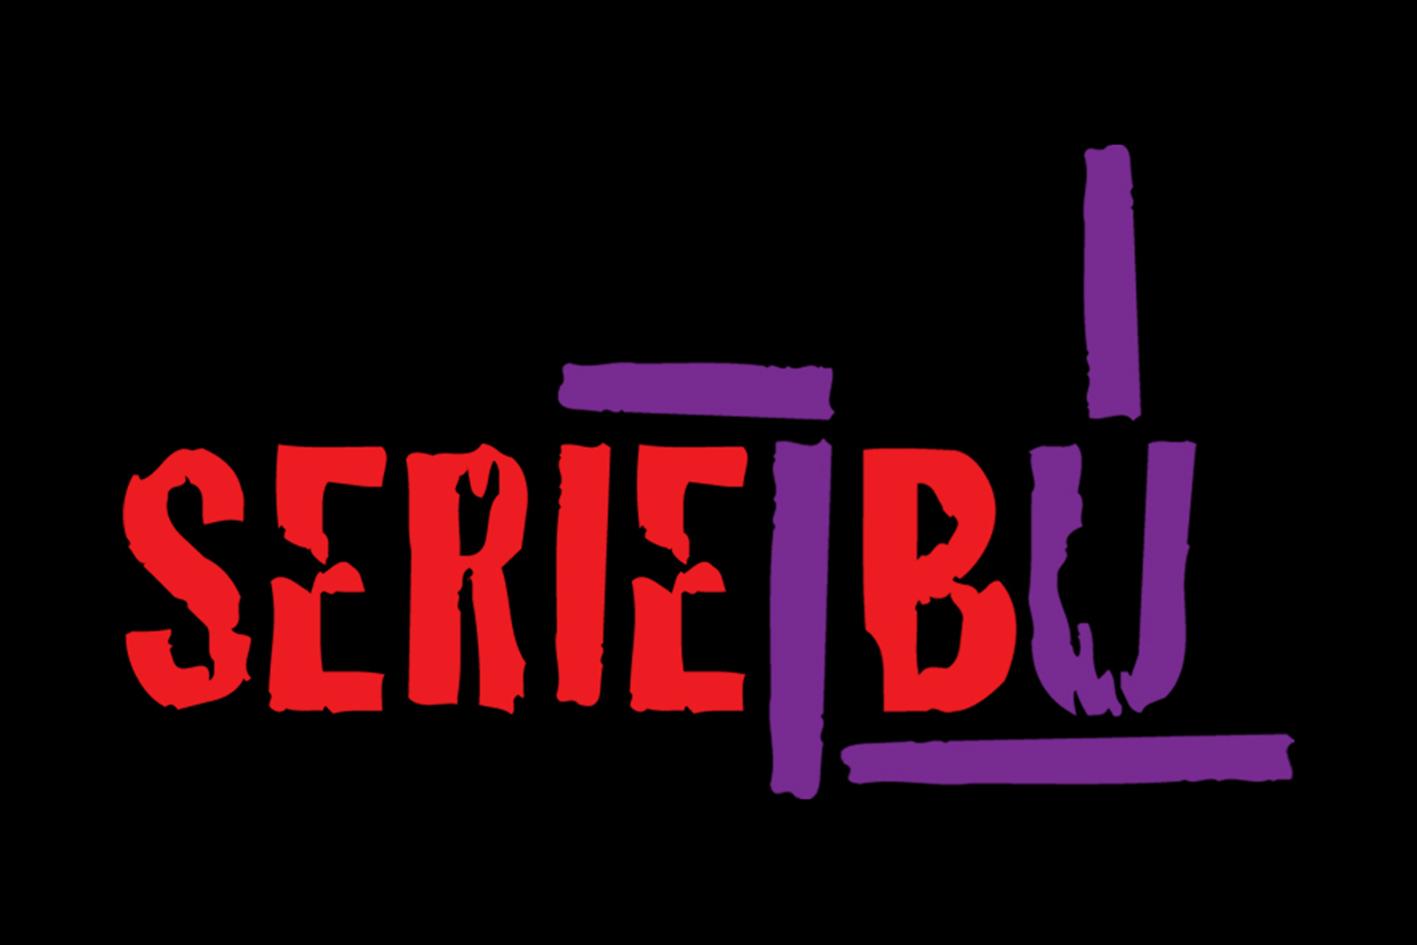 ibu_serie logo pablomad